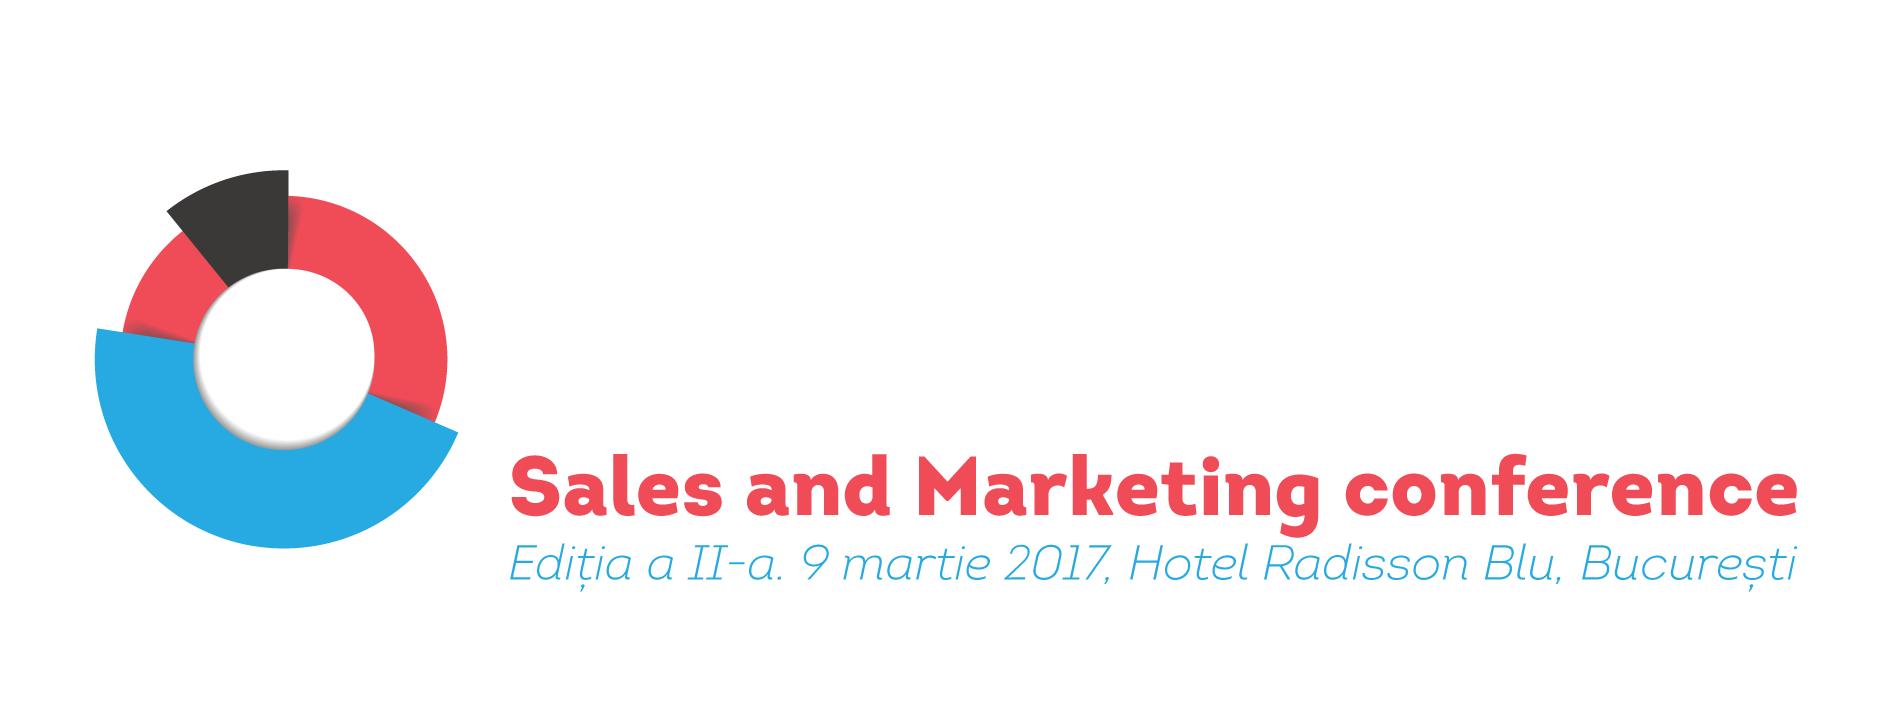 Sales & Marketing Conference, ediția a II-a